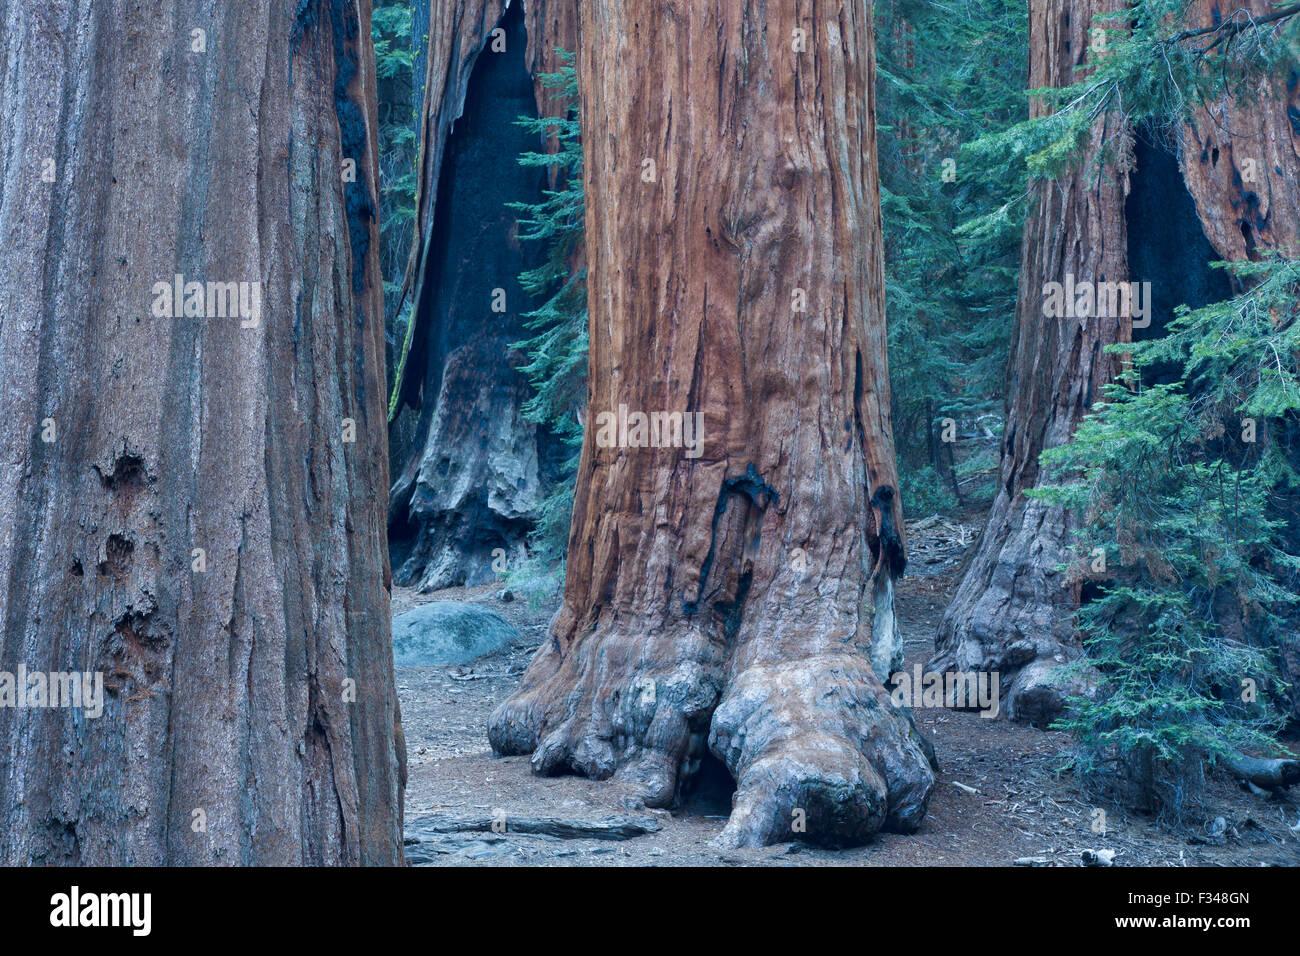 Sequoia gigante alberi di Sequoia National Park, California, Stati Uniti d'America Foto Stock